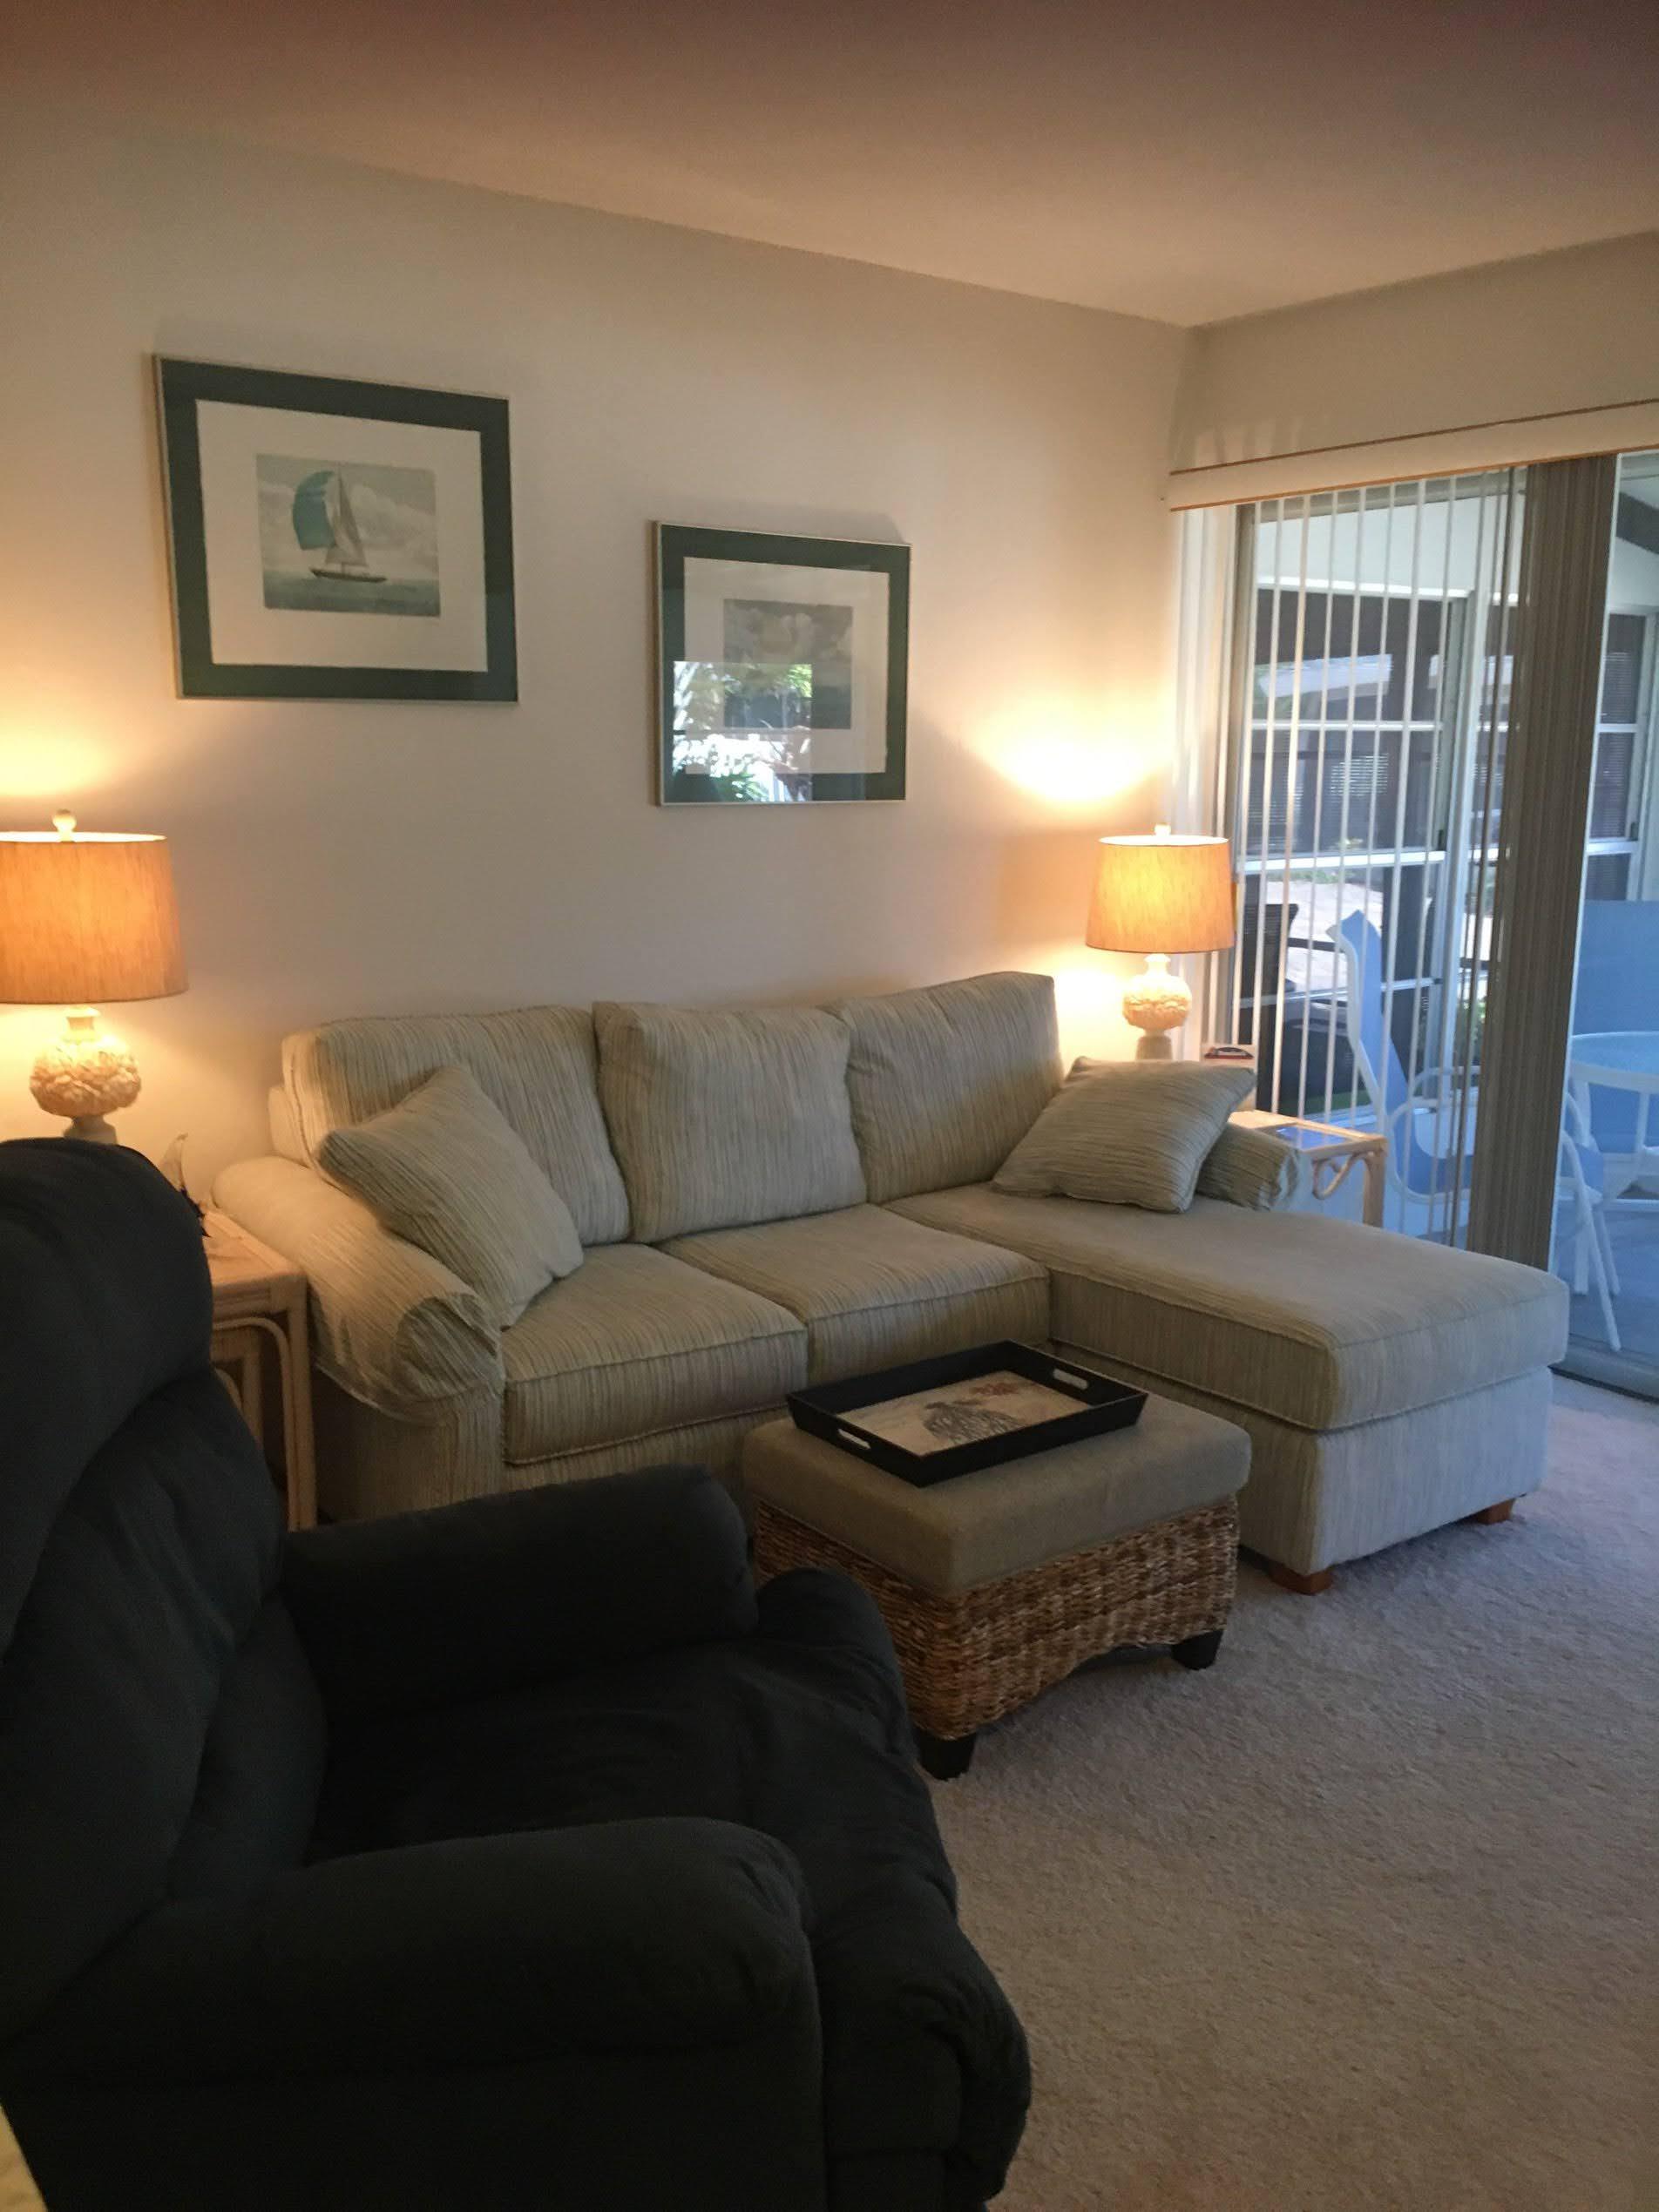 Unit 19 Living Room